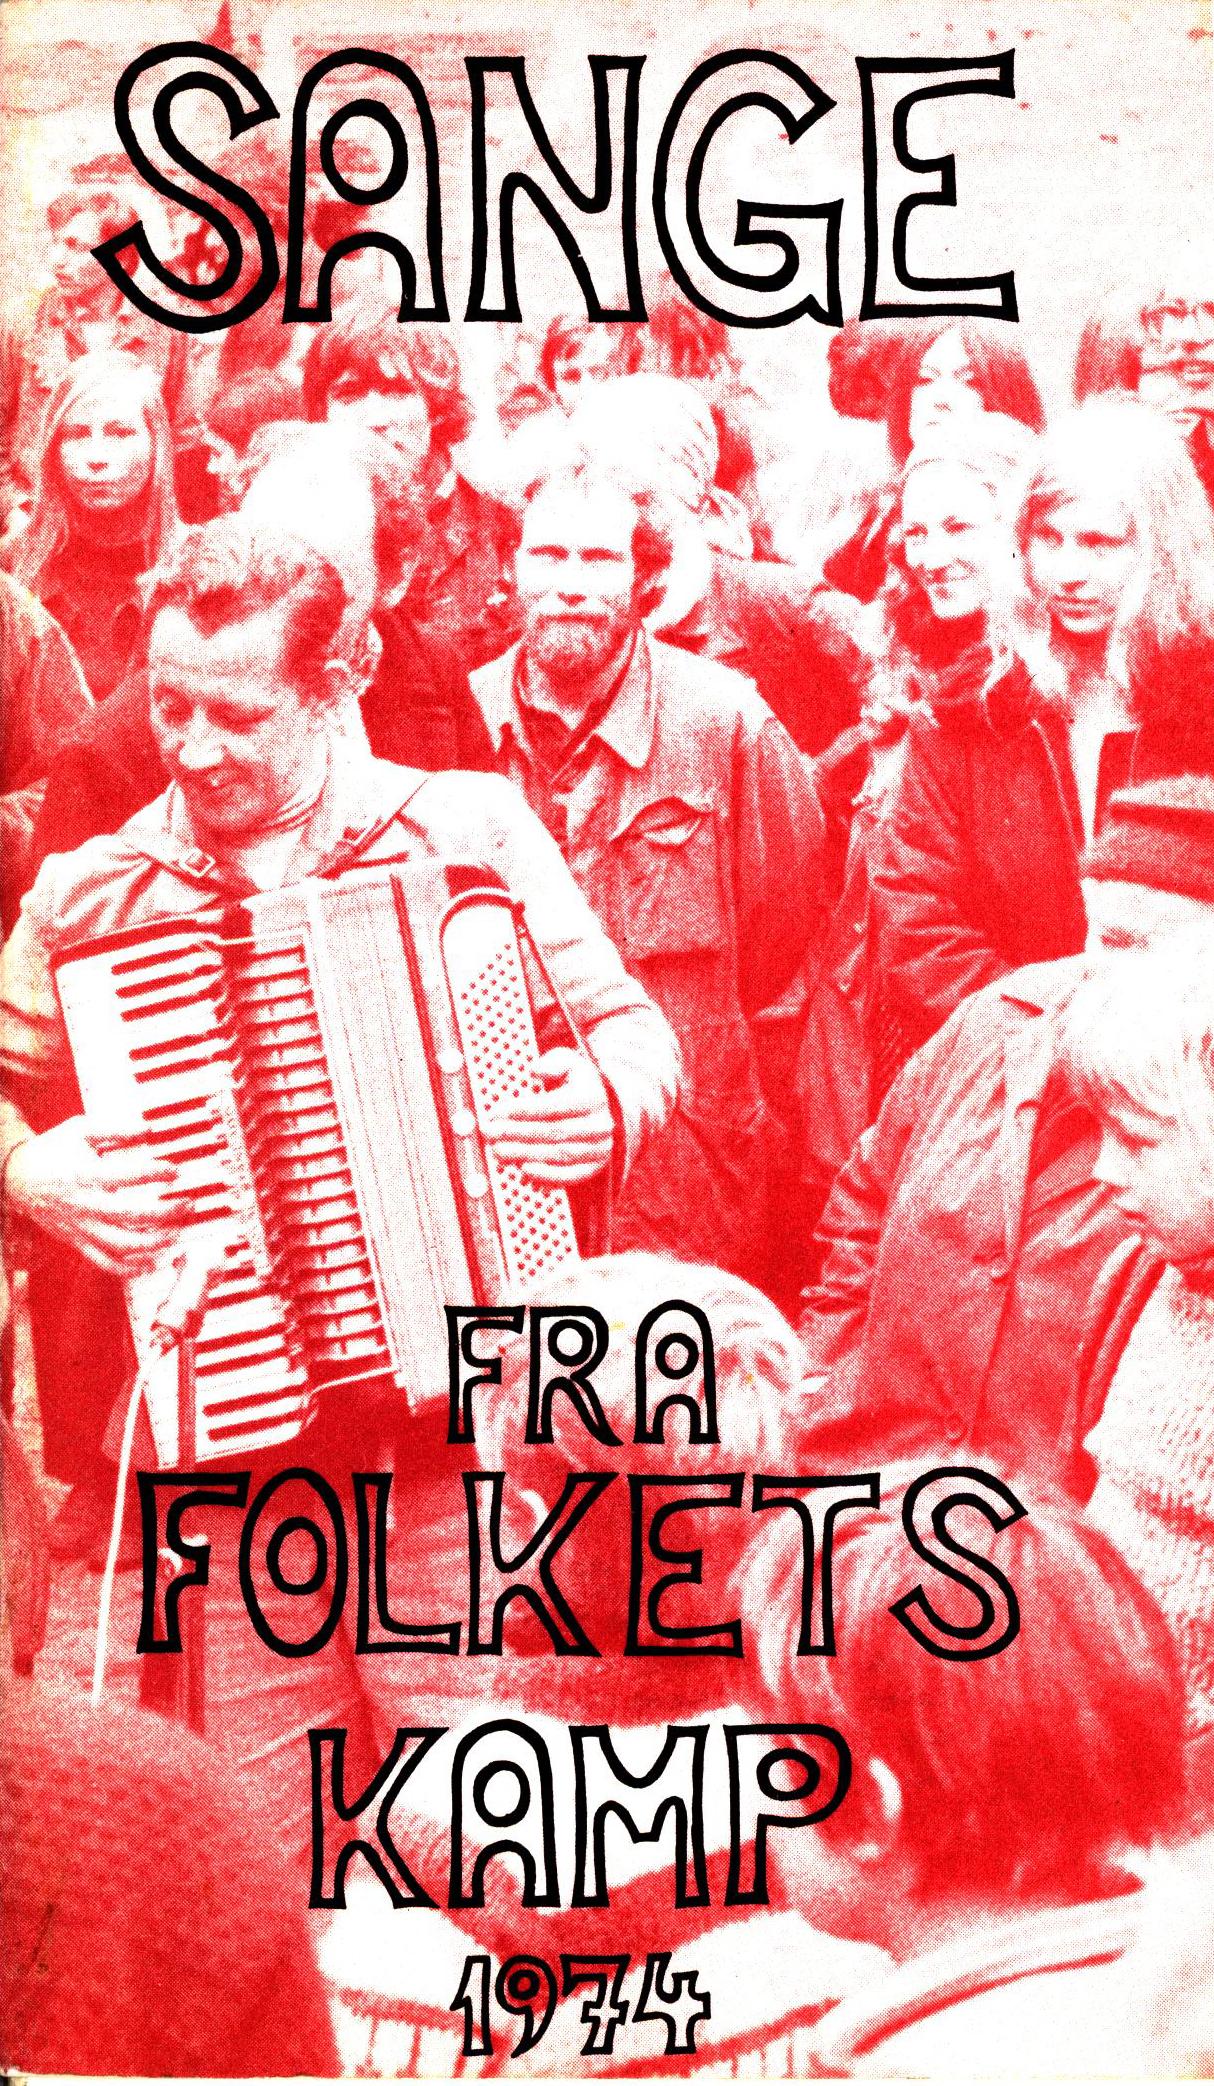 Sange fra folkets kamp 1974